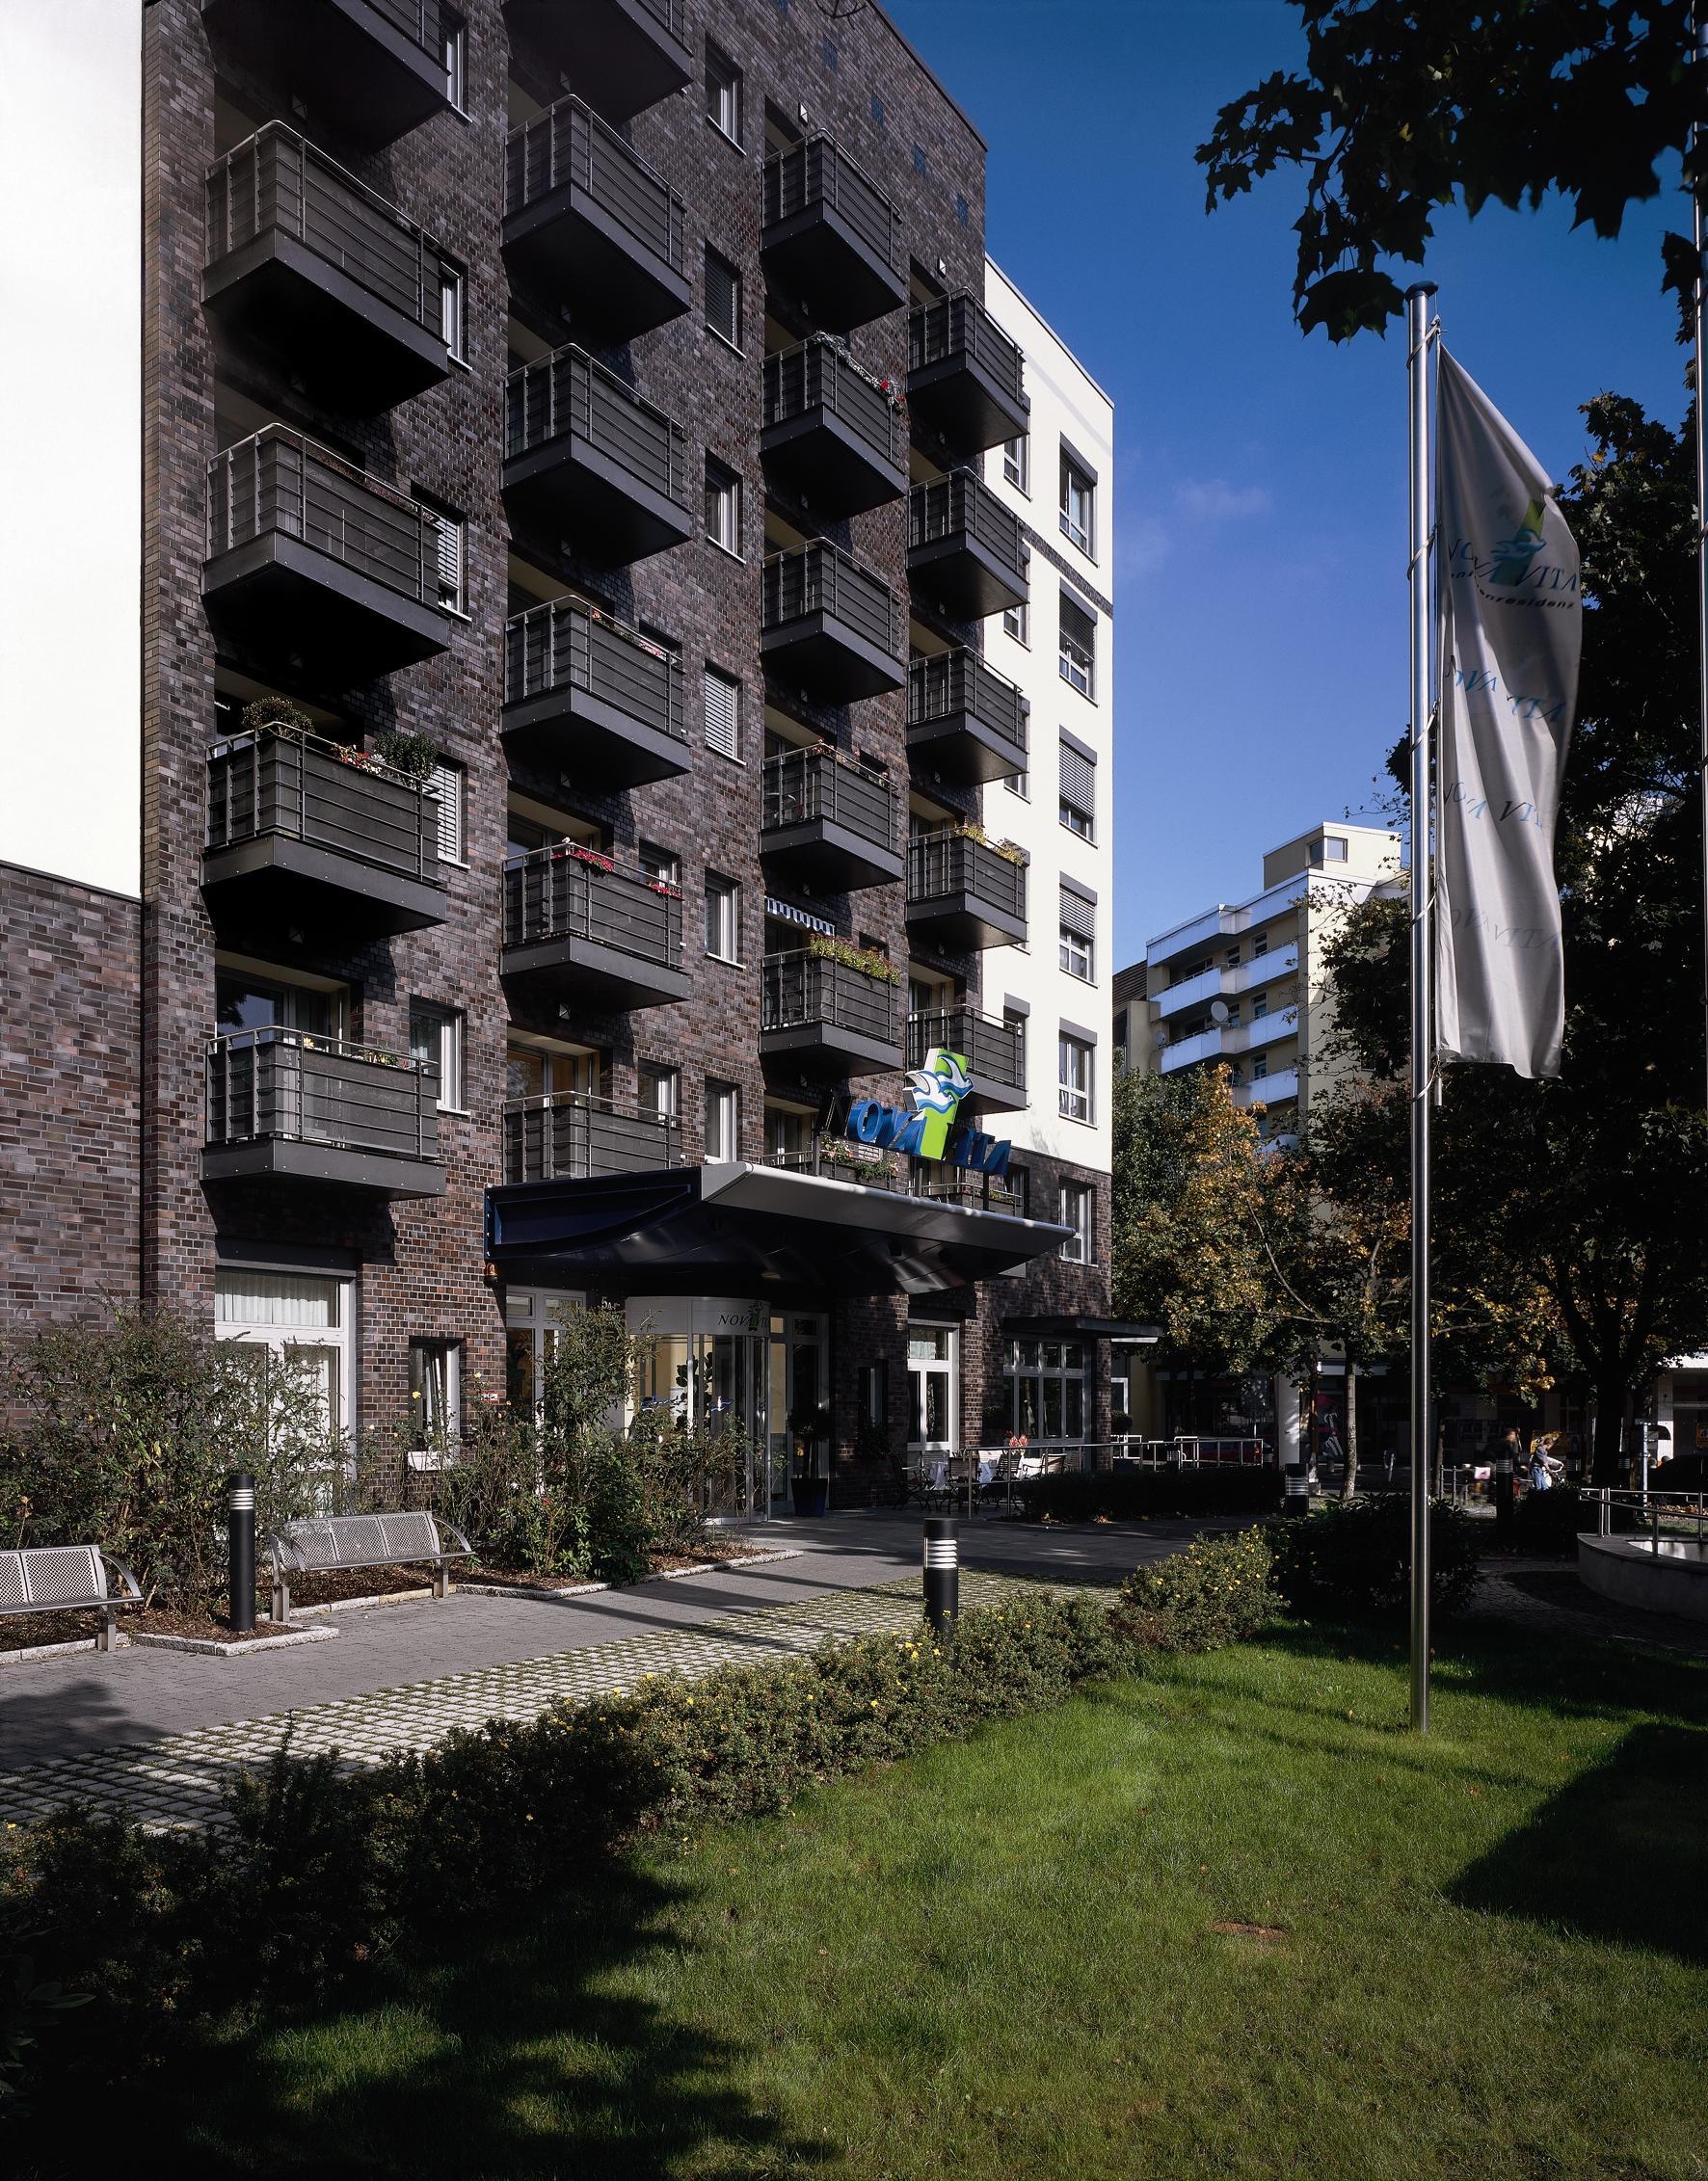 Nova Vita Residenz Berlin-Wilmersdorf